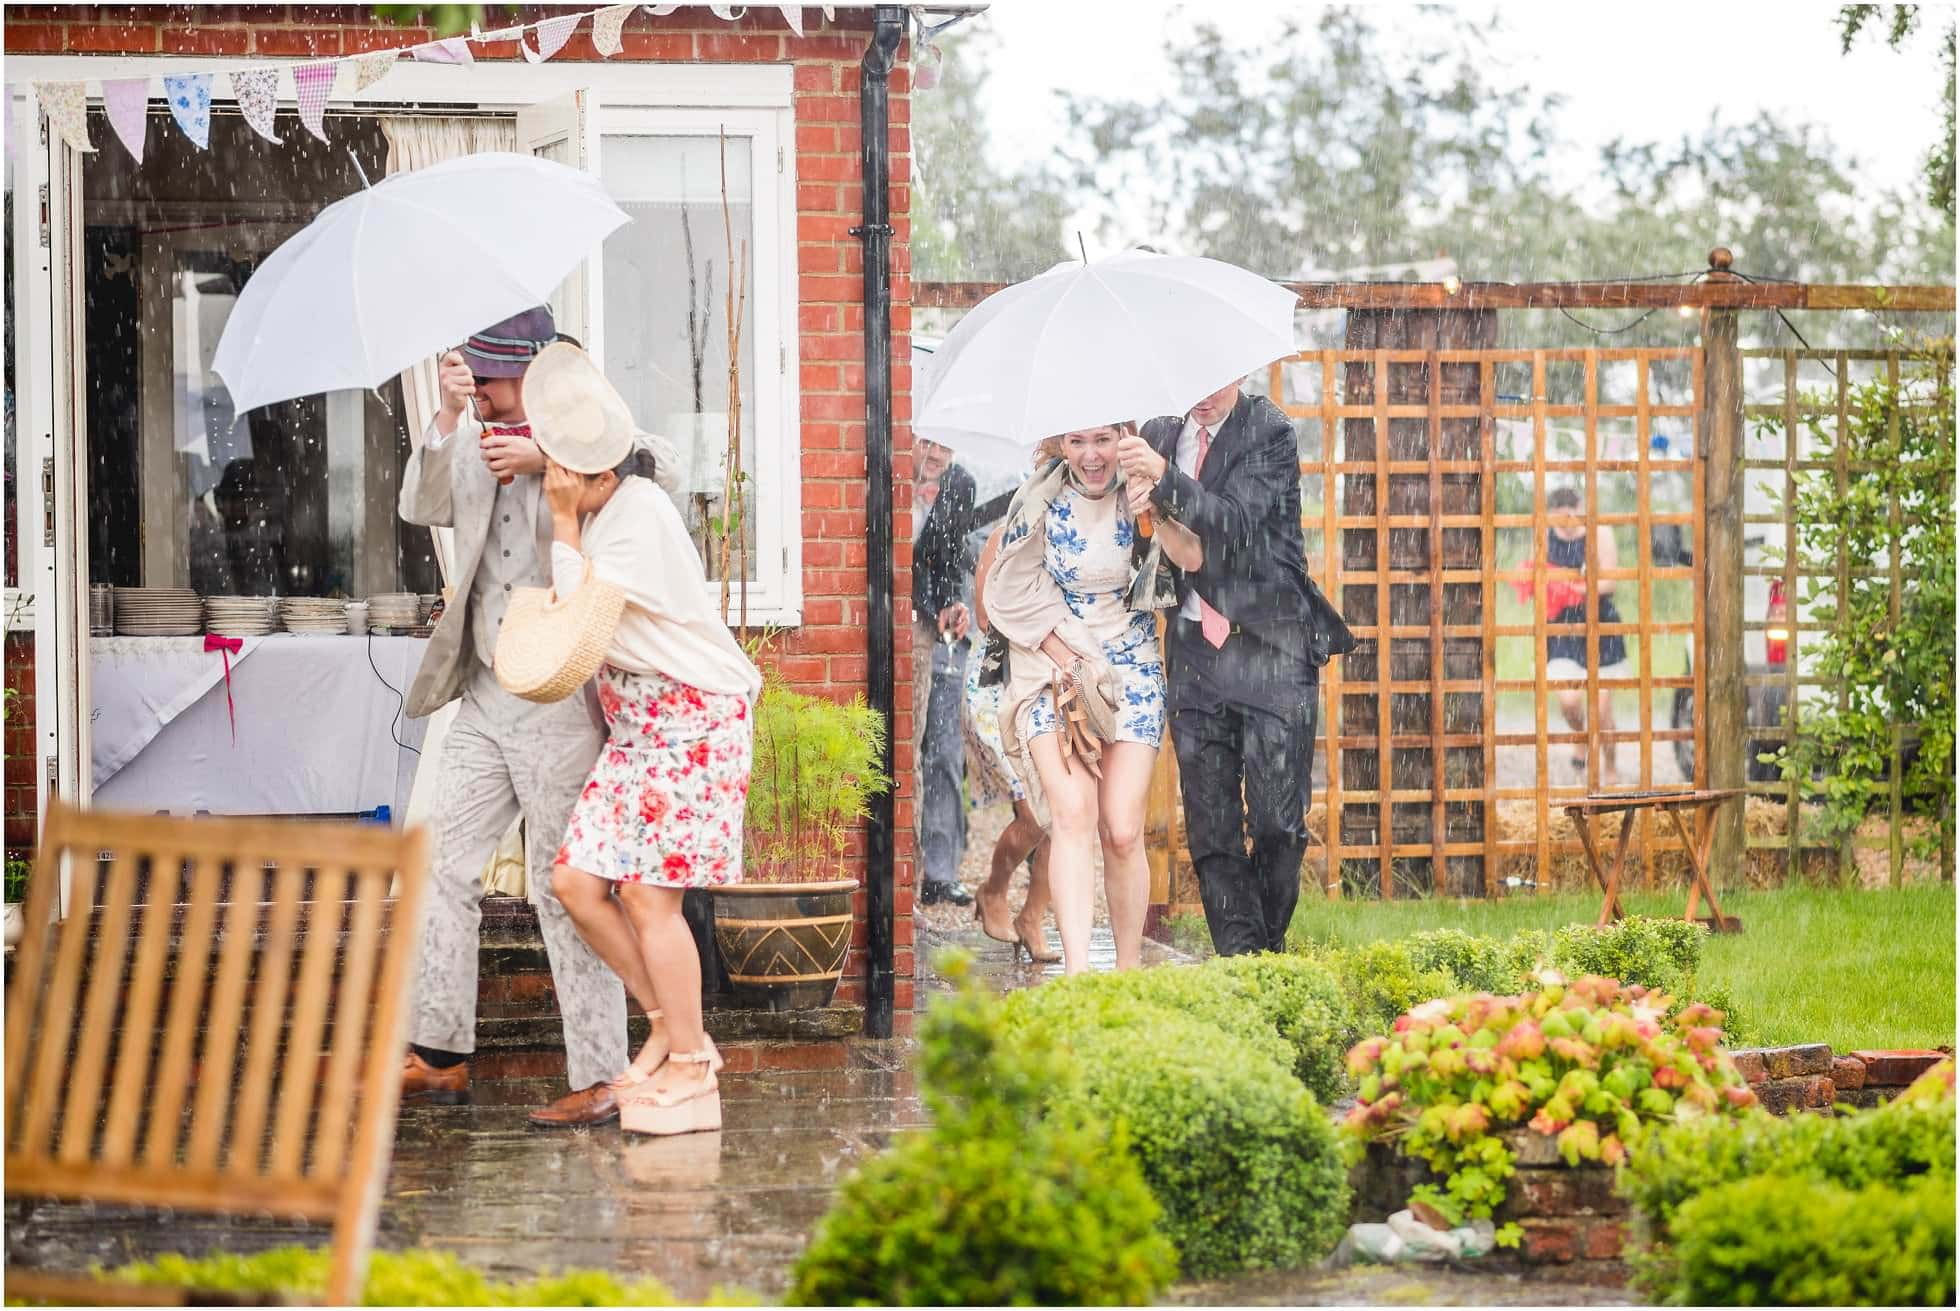 wet wedding!